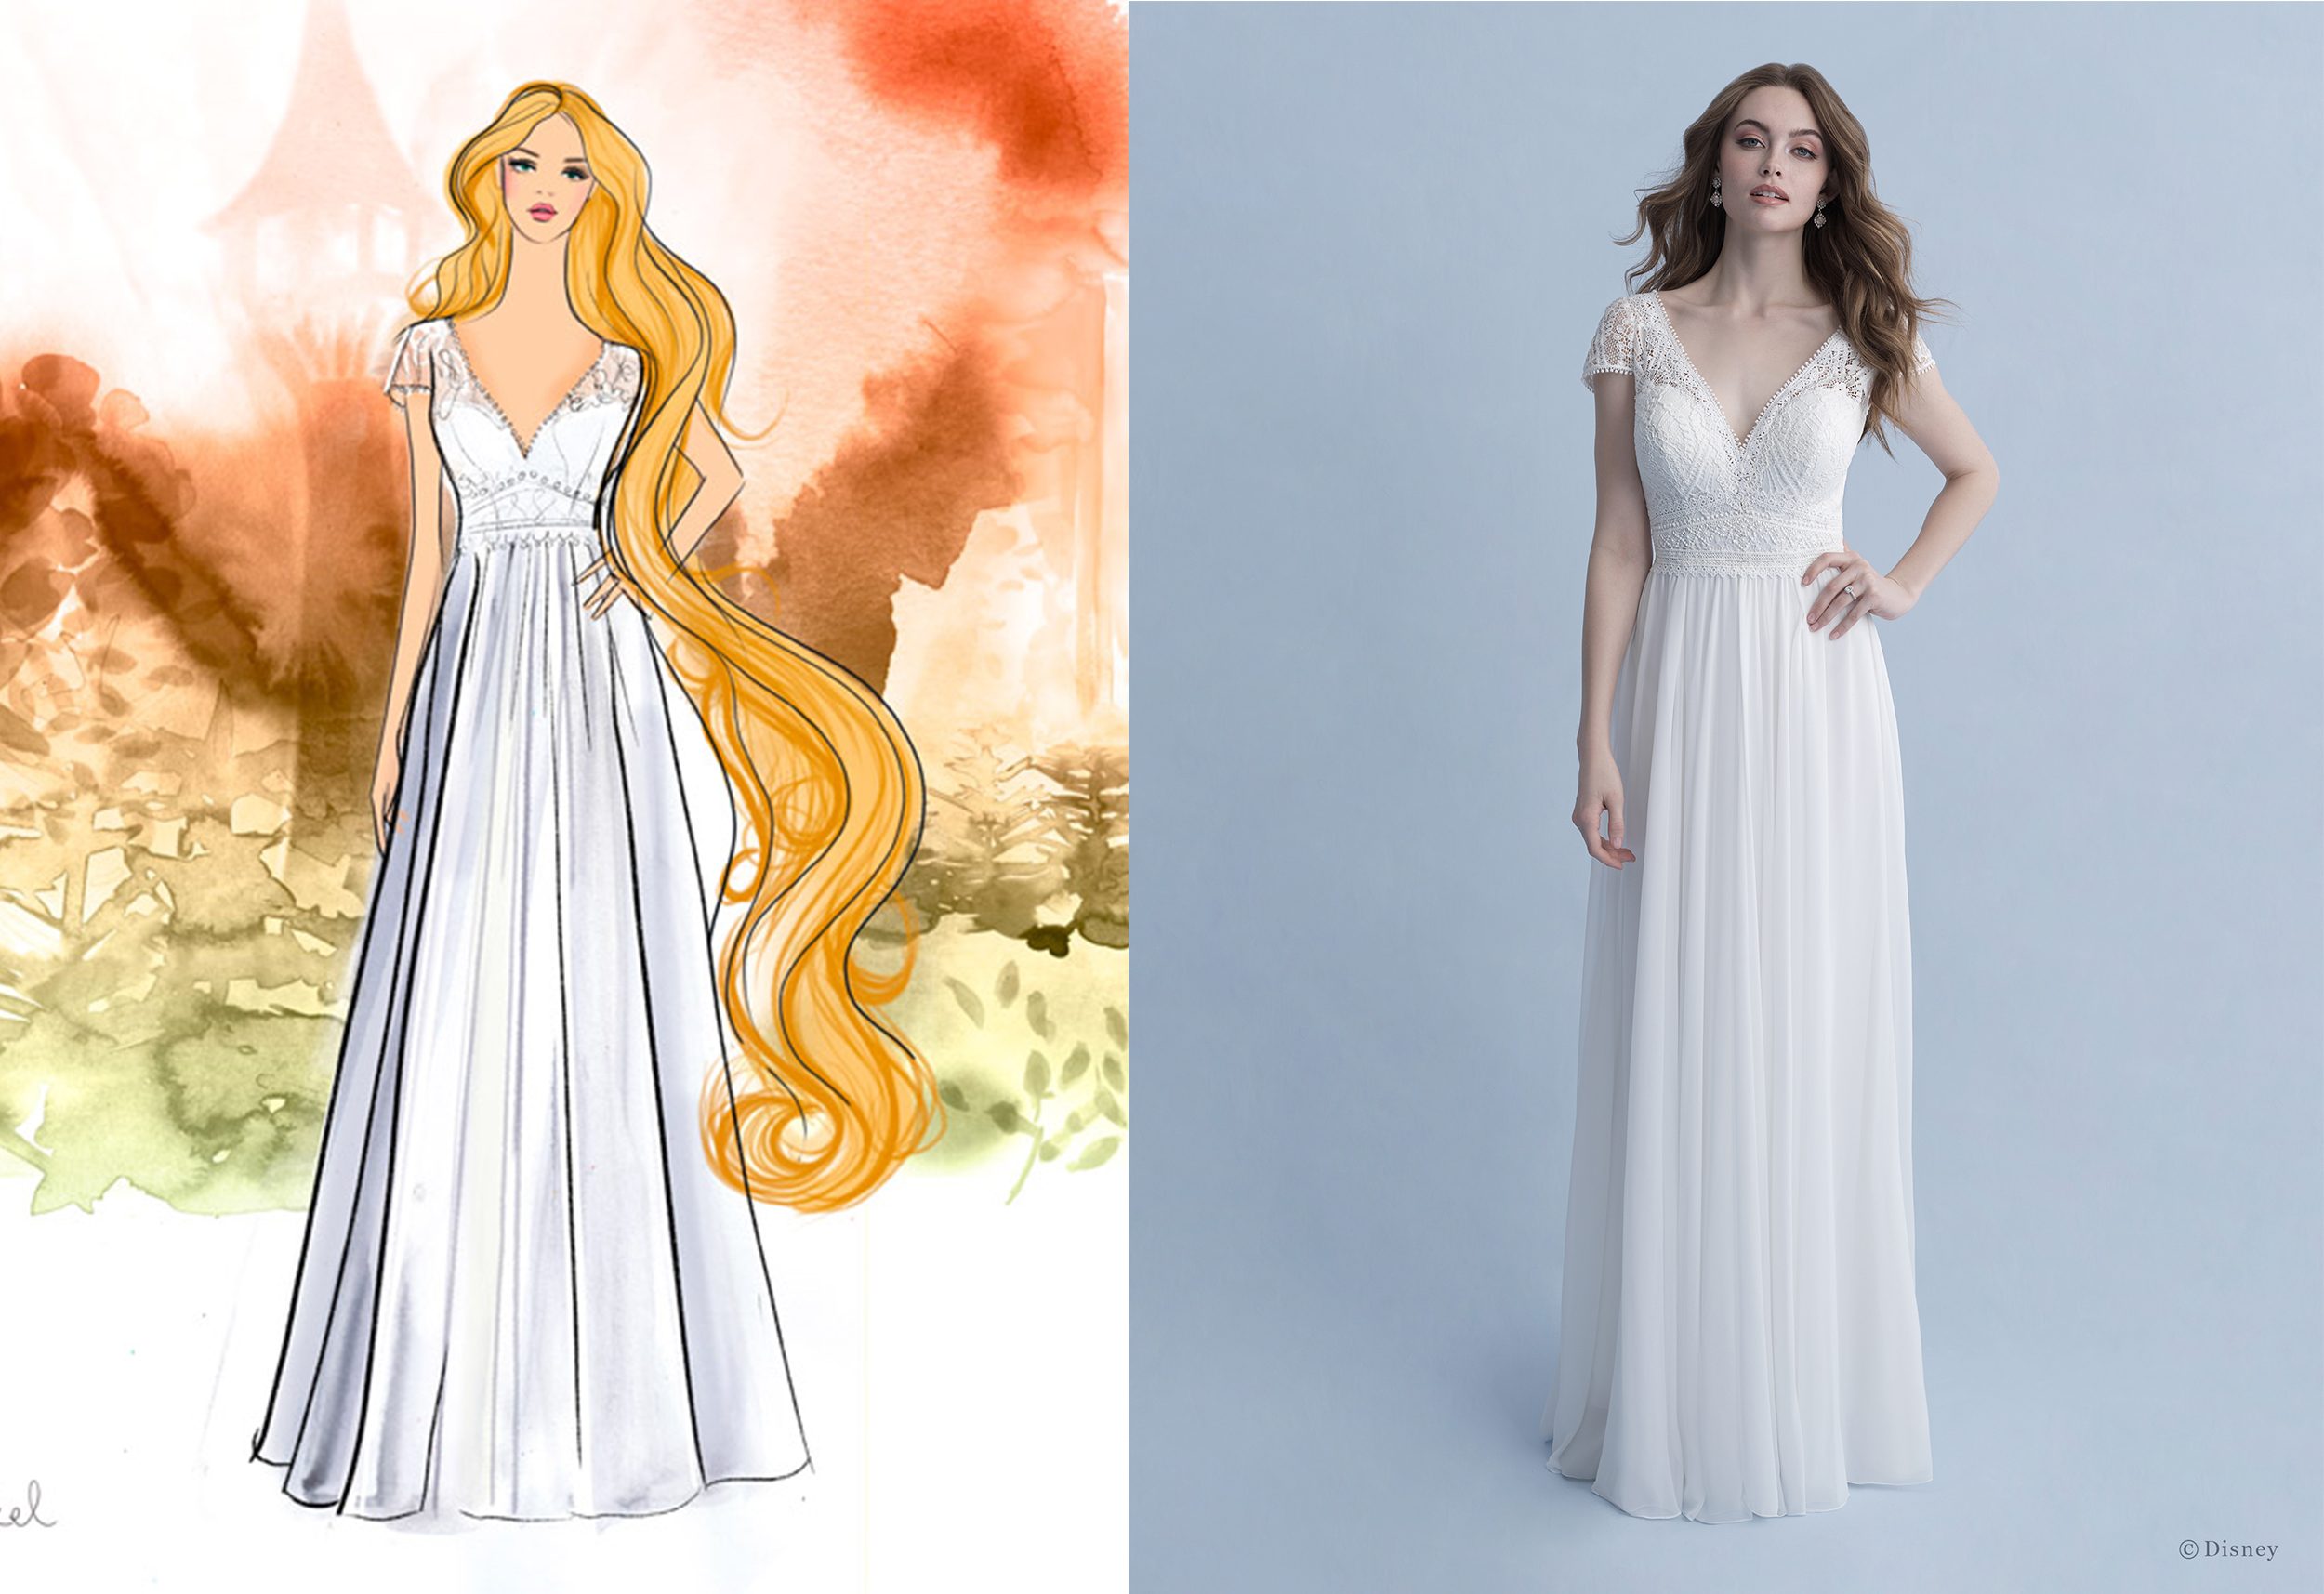 Disney Princess Wedding Gowns At Bridal Boutiques Near You,Wedding Pakistani Women Dress